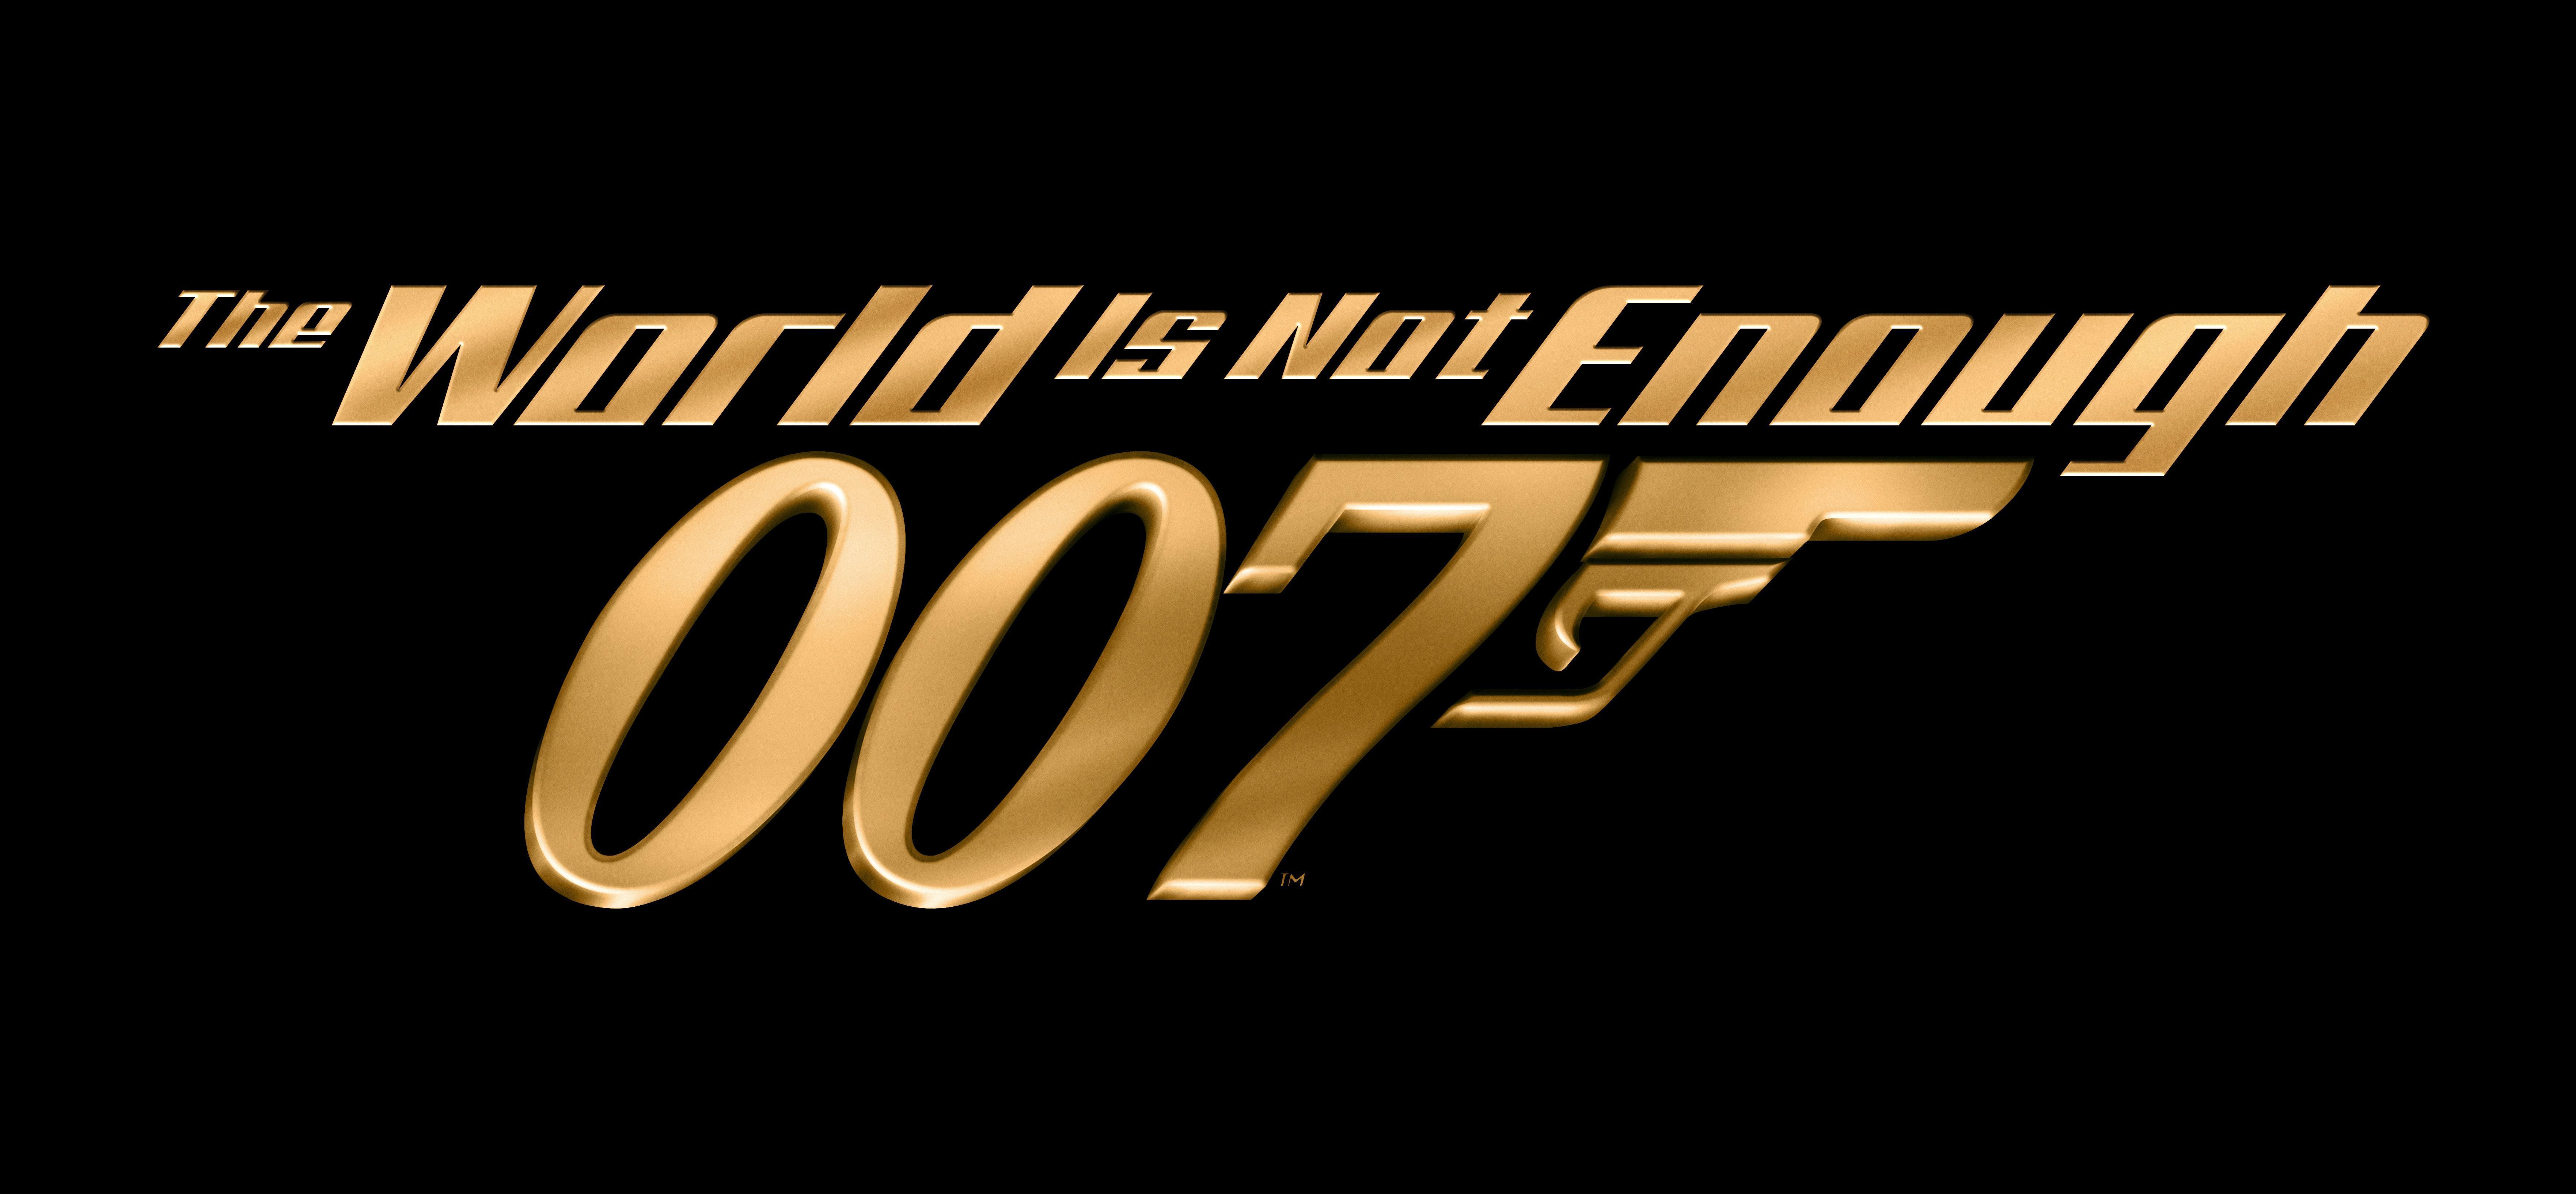 james bond 007 logos